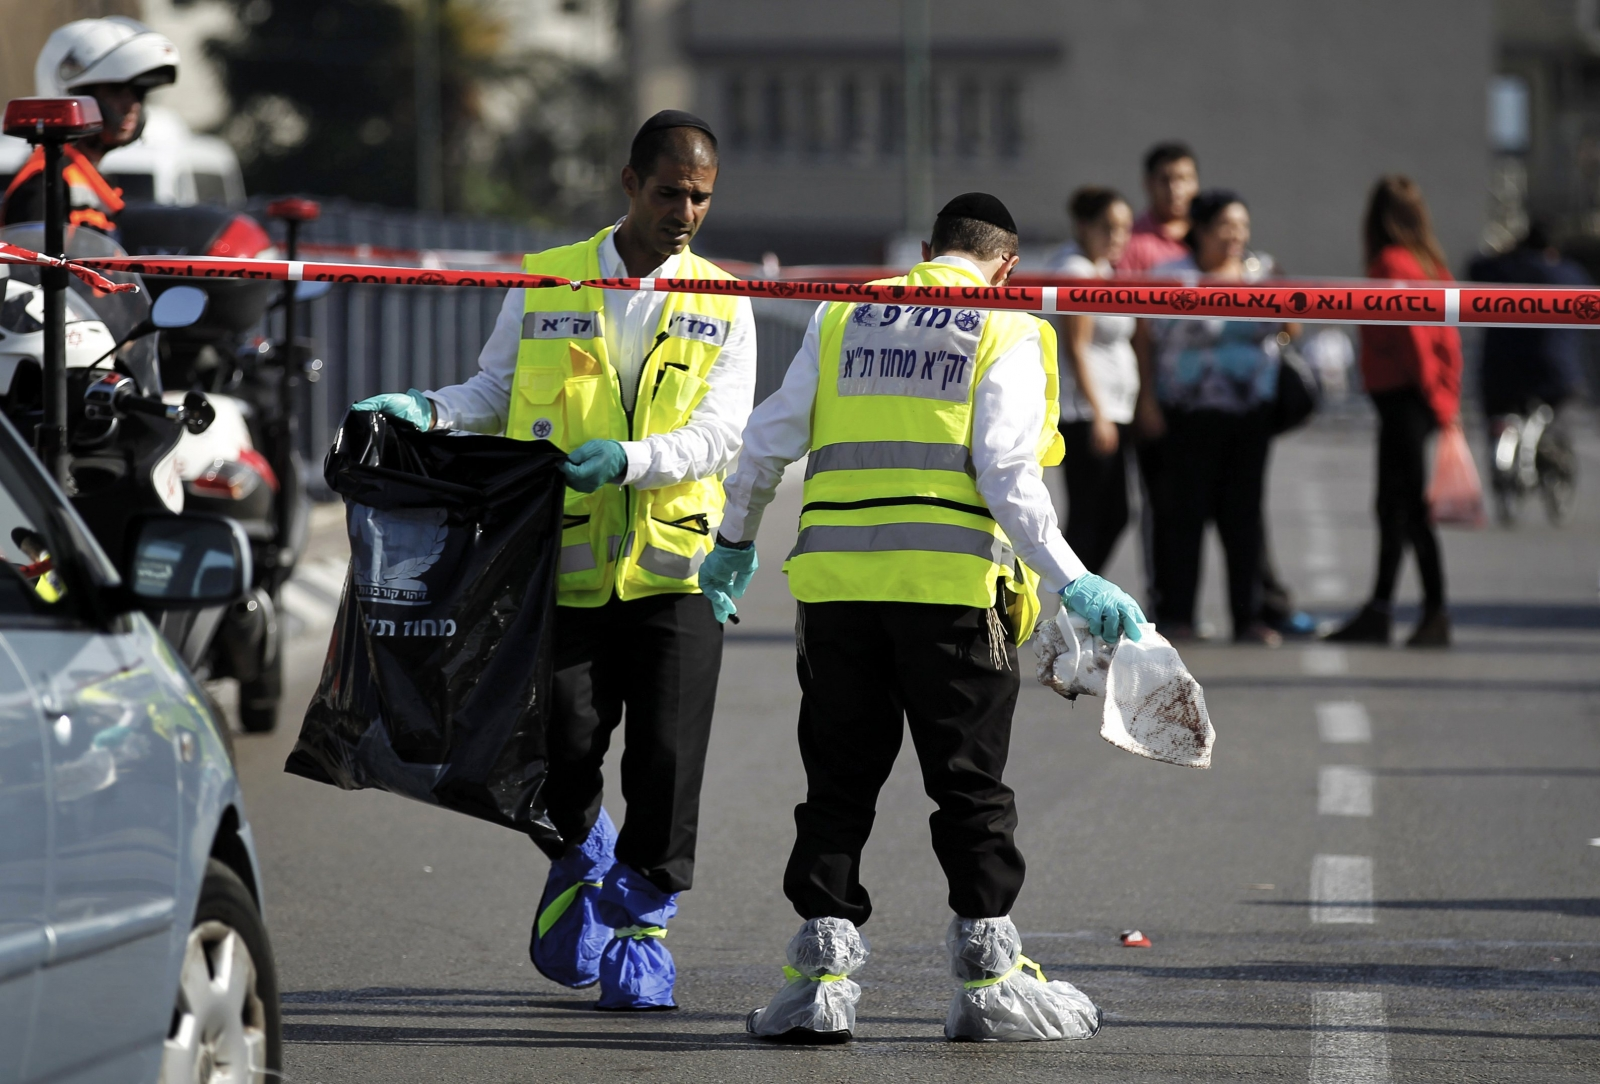 Israeli Stabbed in Suspected Palestinian Attack in Tel Aviv